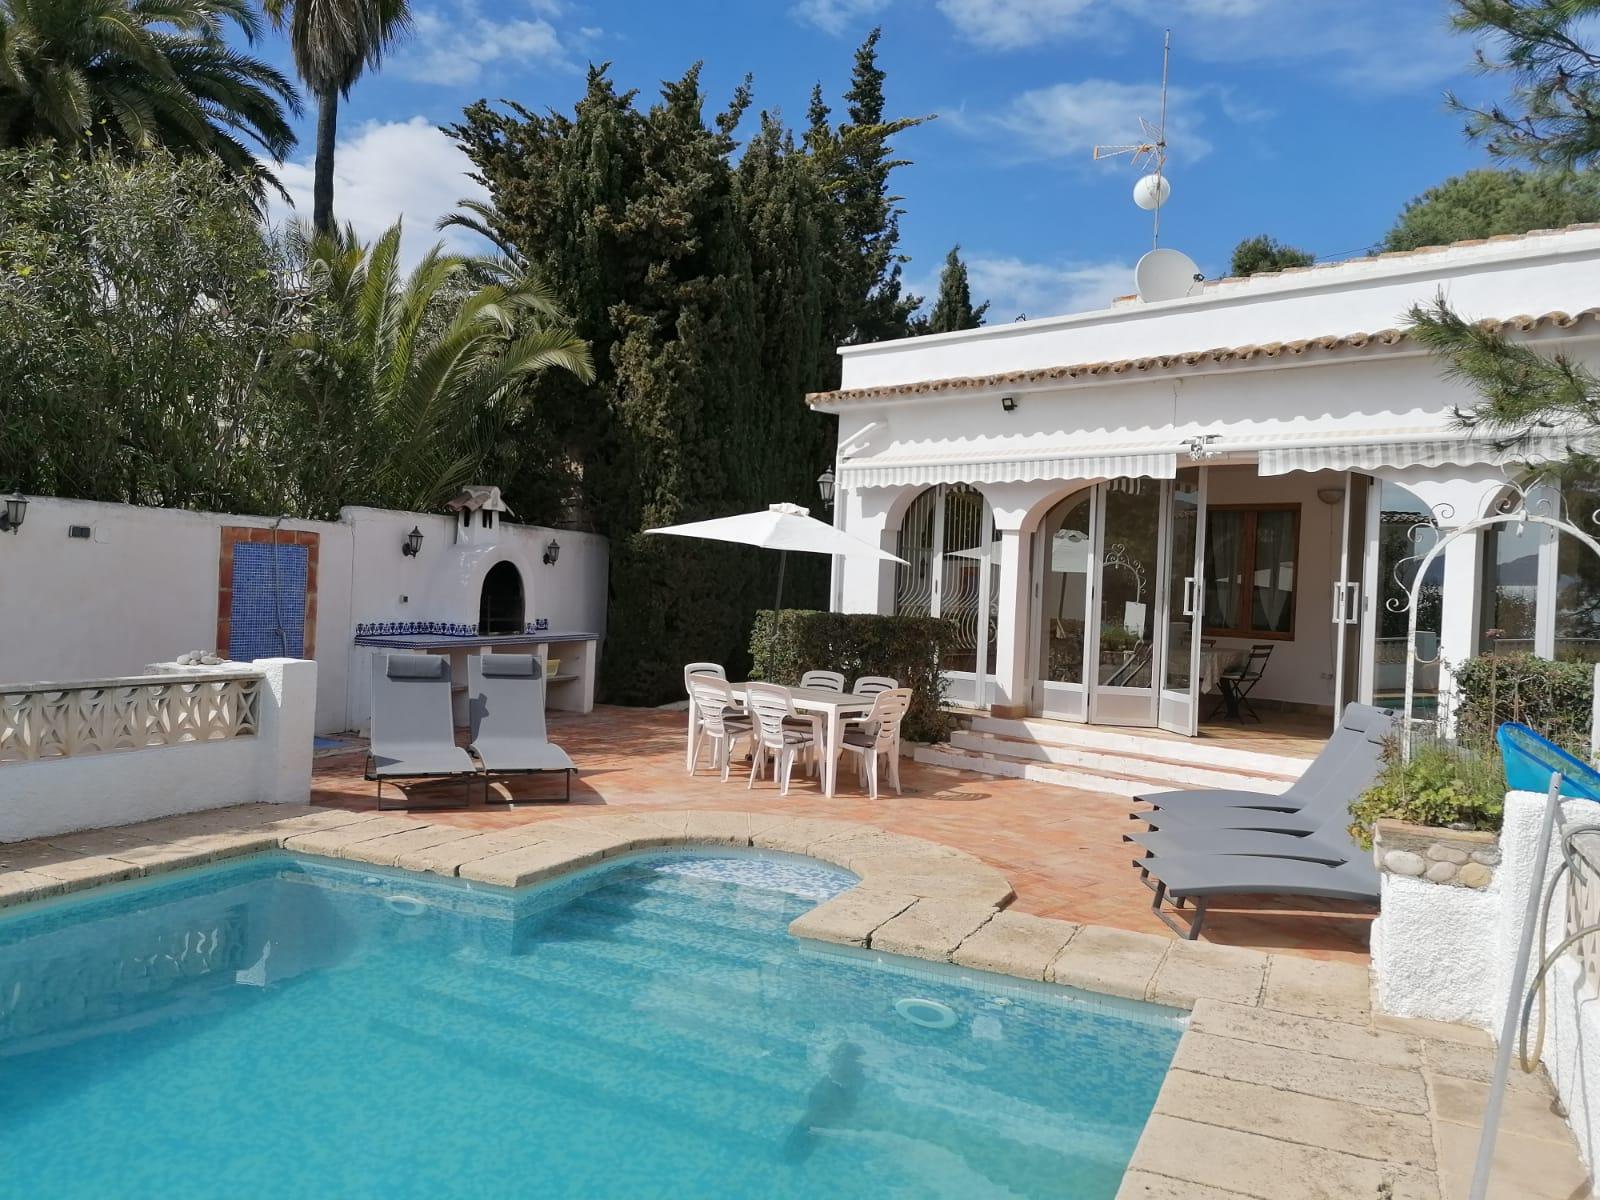 Villa 2001,Villa in Moraira, on the Costa Blanca, Spain  with private pool for 6 persons.....